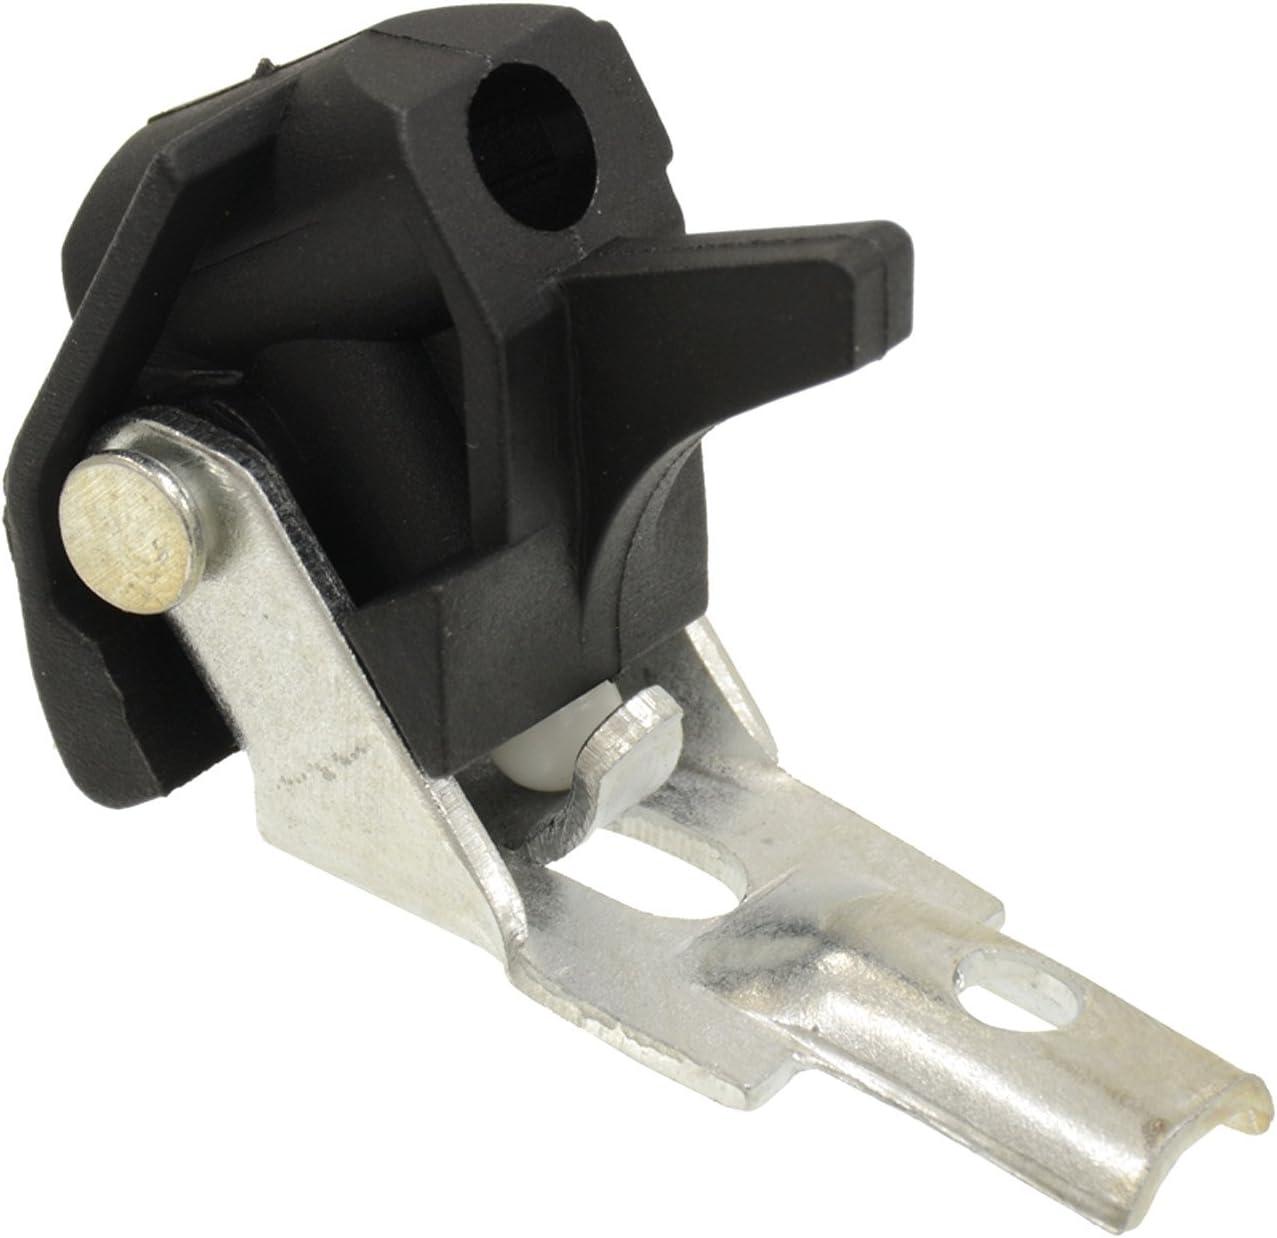 1984-1989 Corvette Headlight Dimmer Switch Actuator Pivot